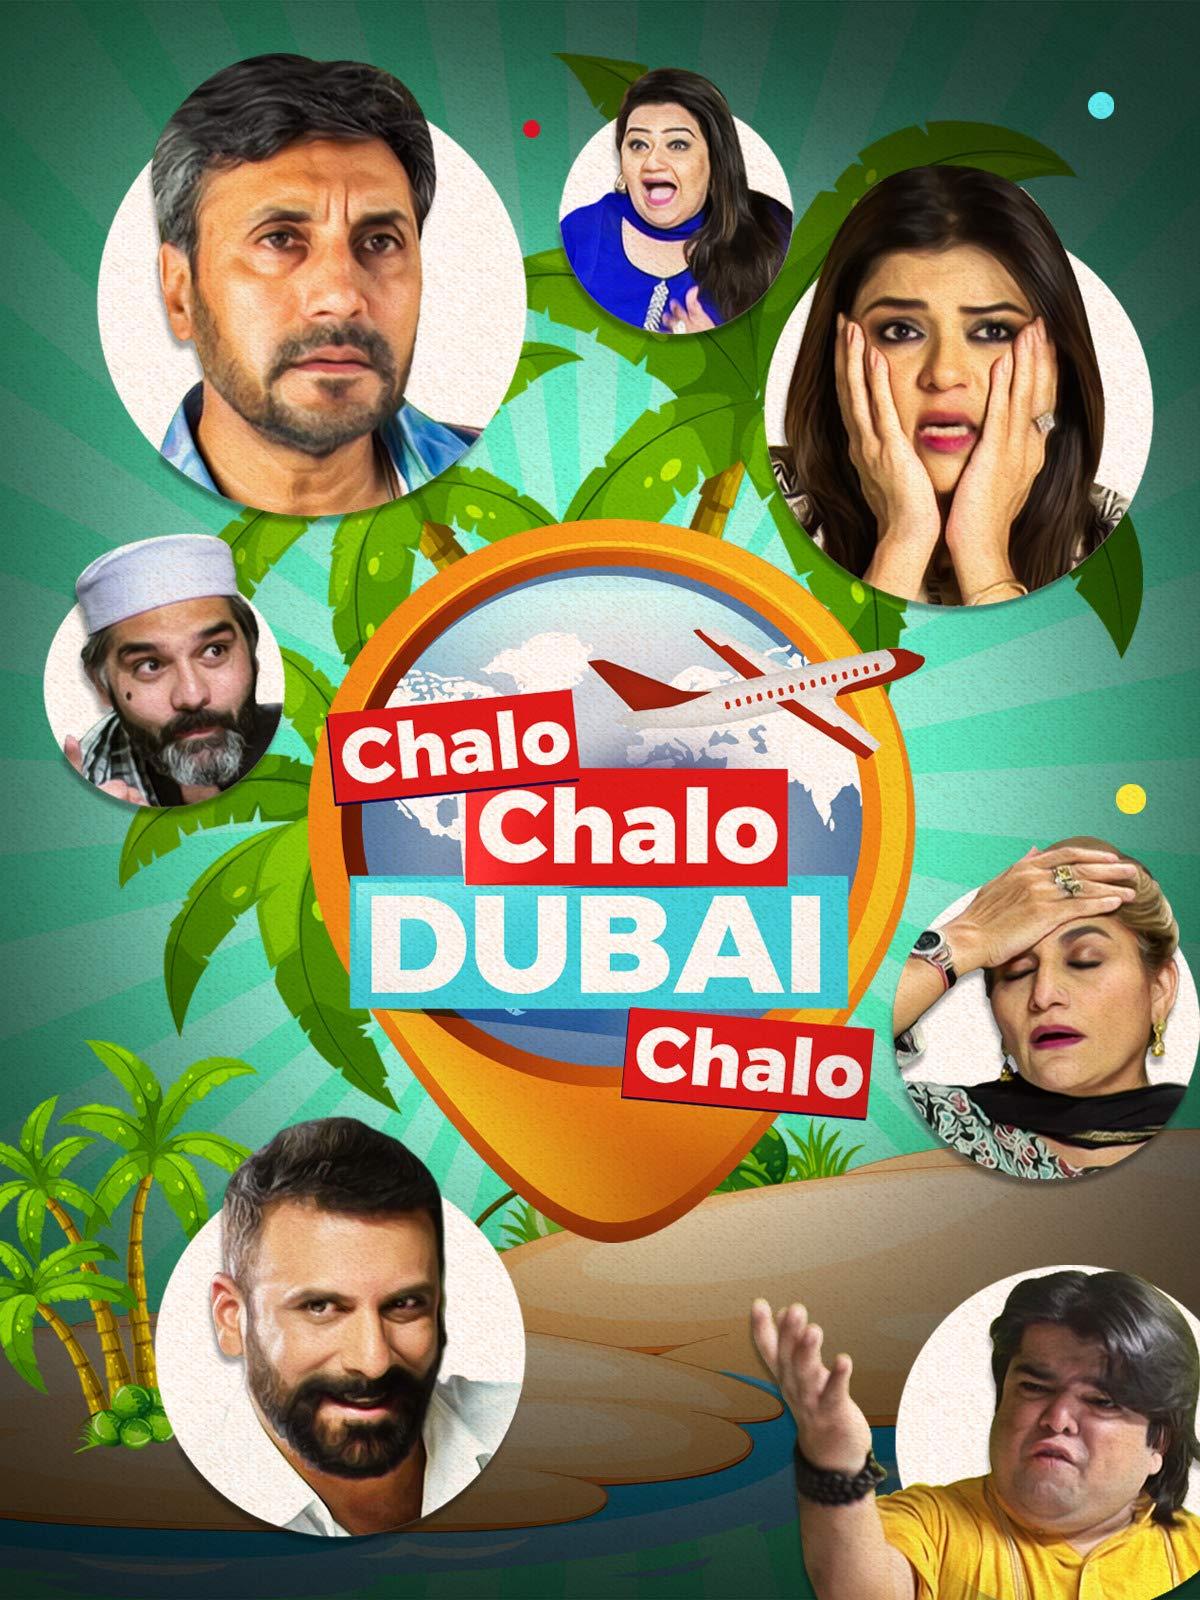 Chalo Chalo Dubai Chalo